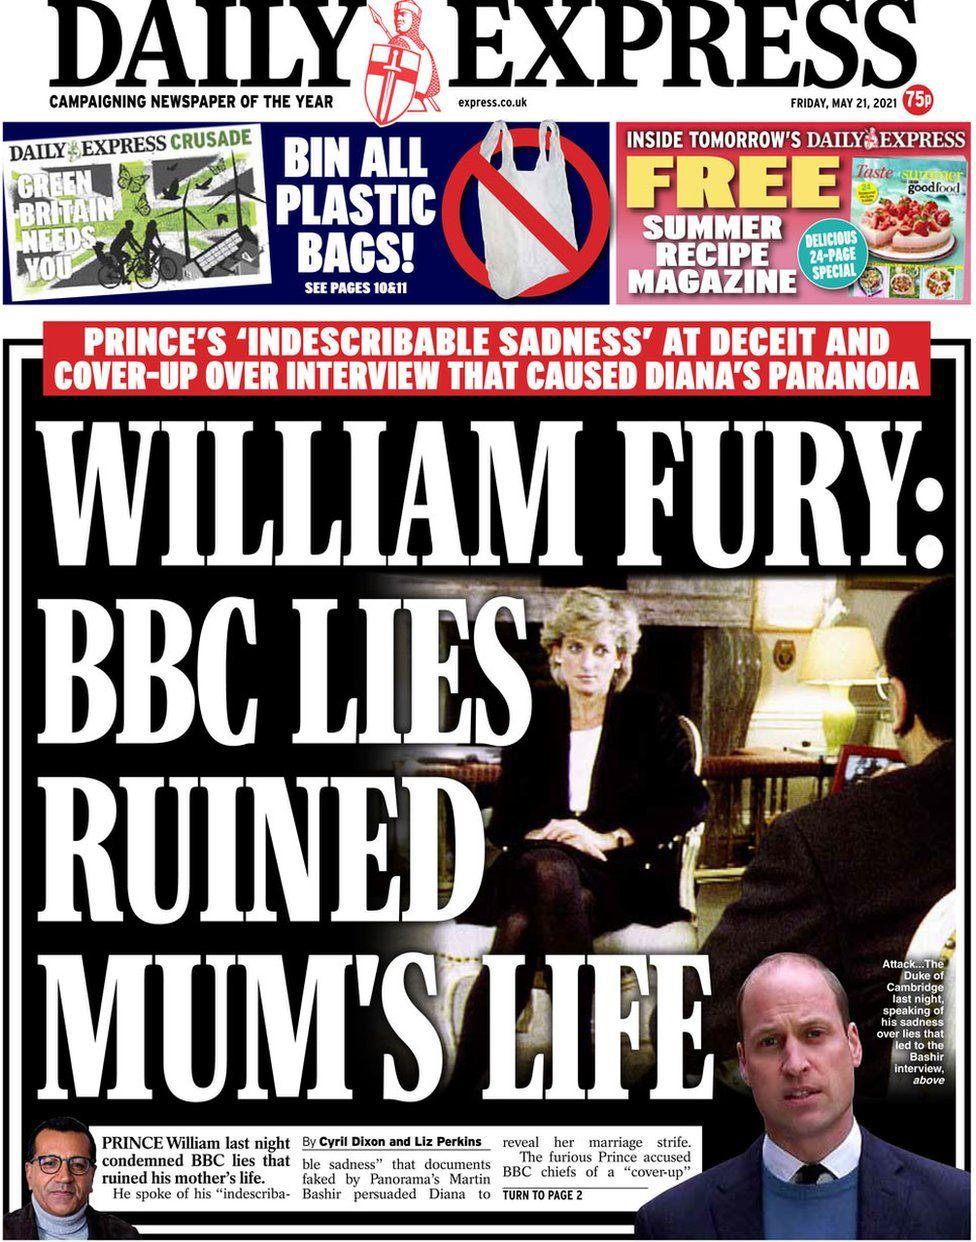 The Daily Express 21 May